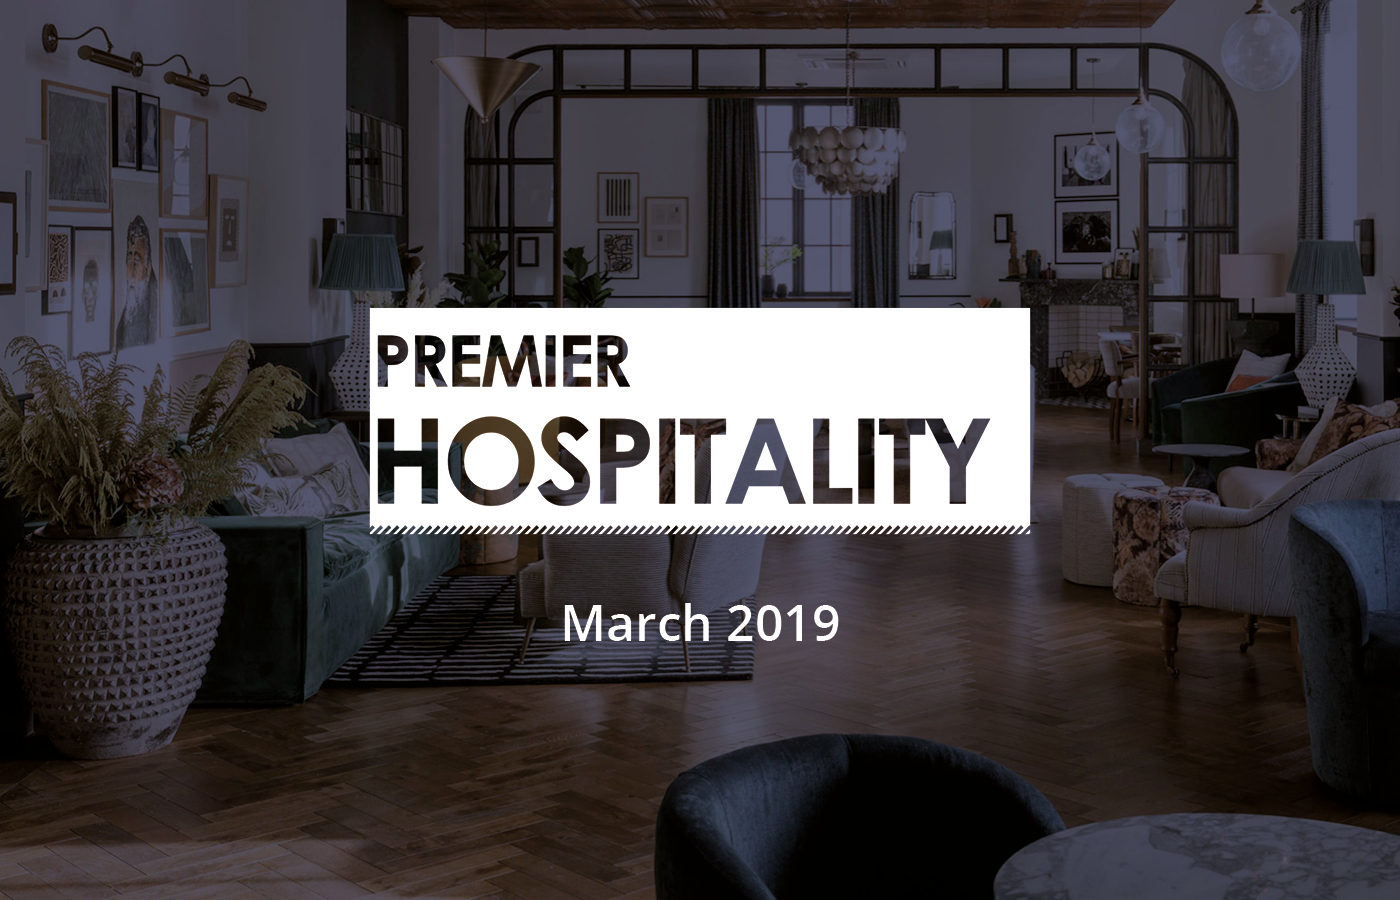 Run For The Hills Press Premier Hospitality Tivoli Cool Cinema